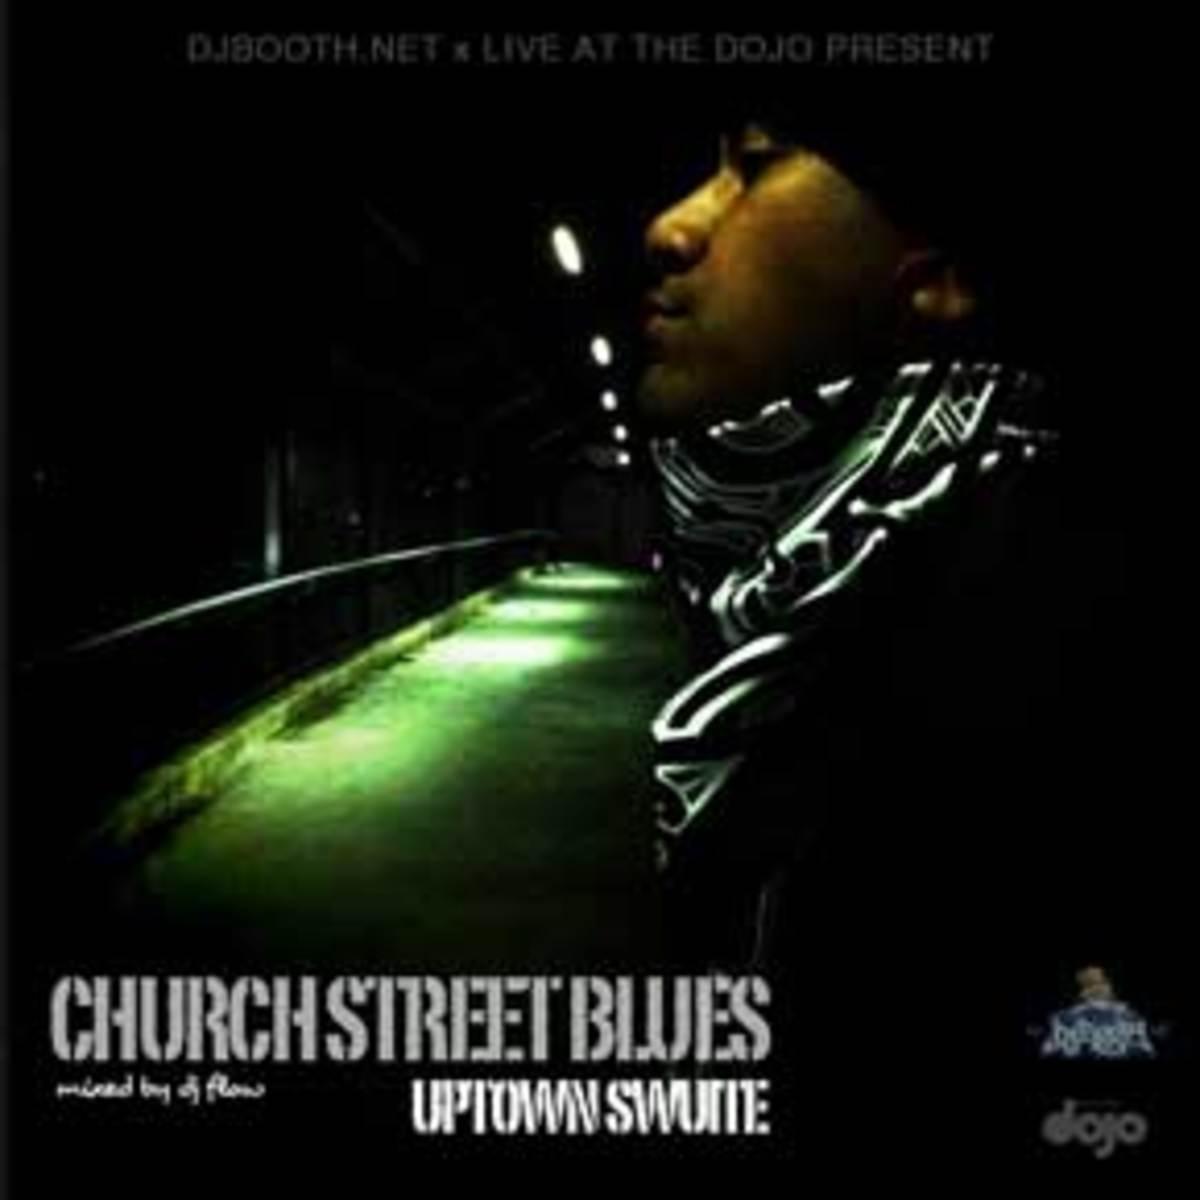 church-street-blues-front.jpg